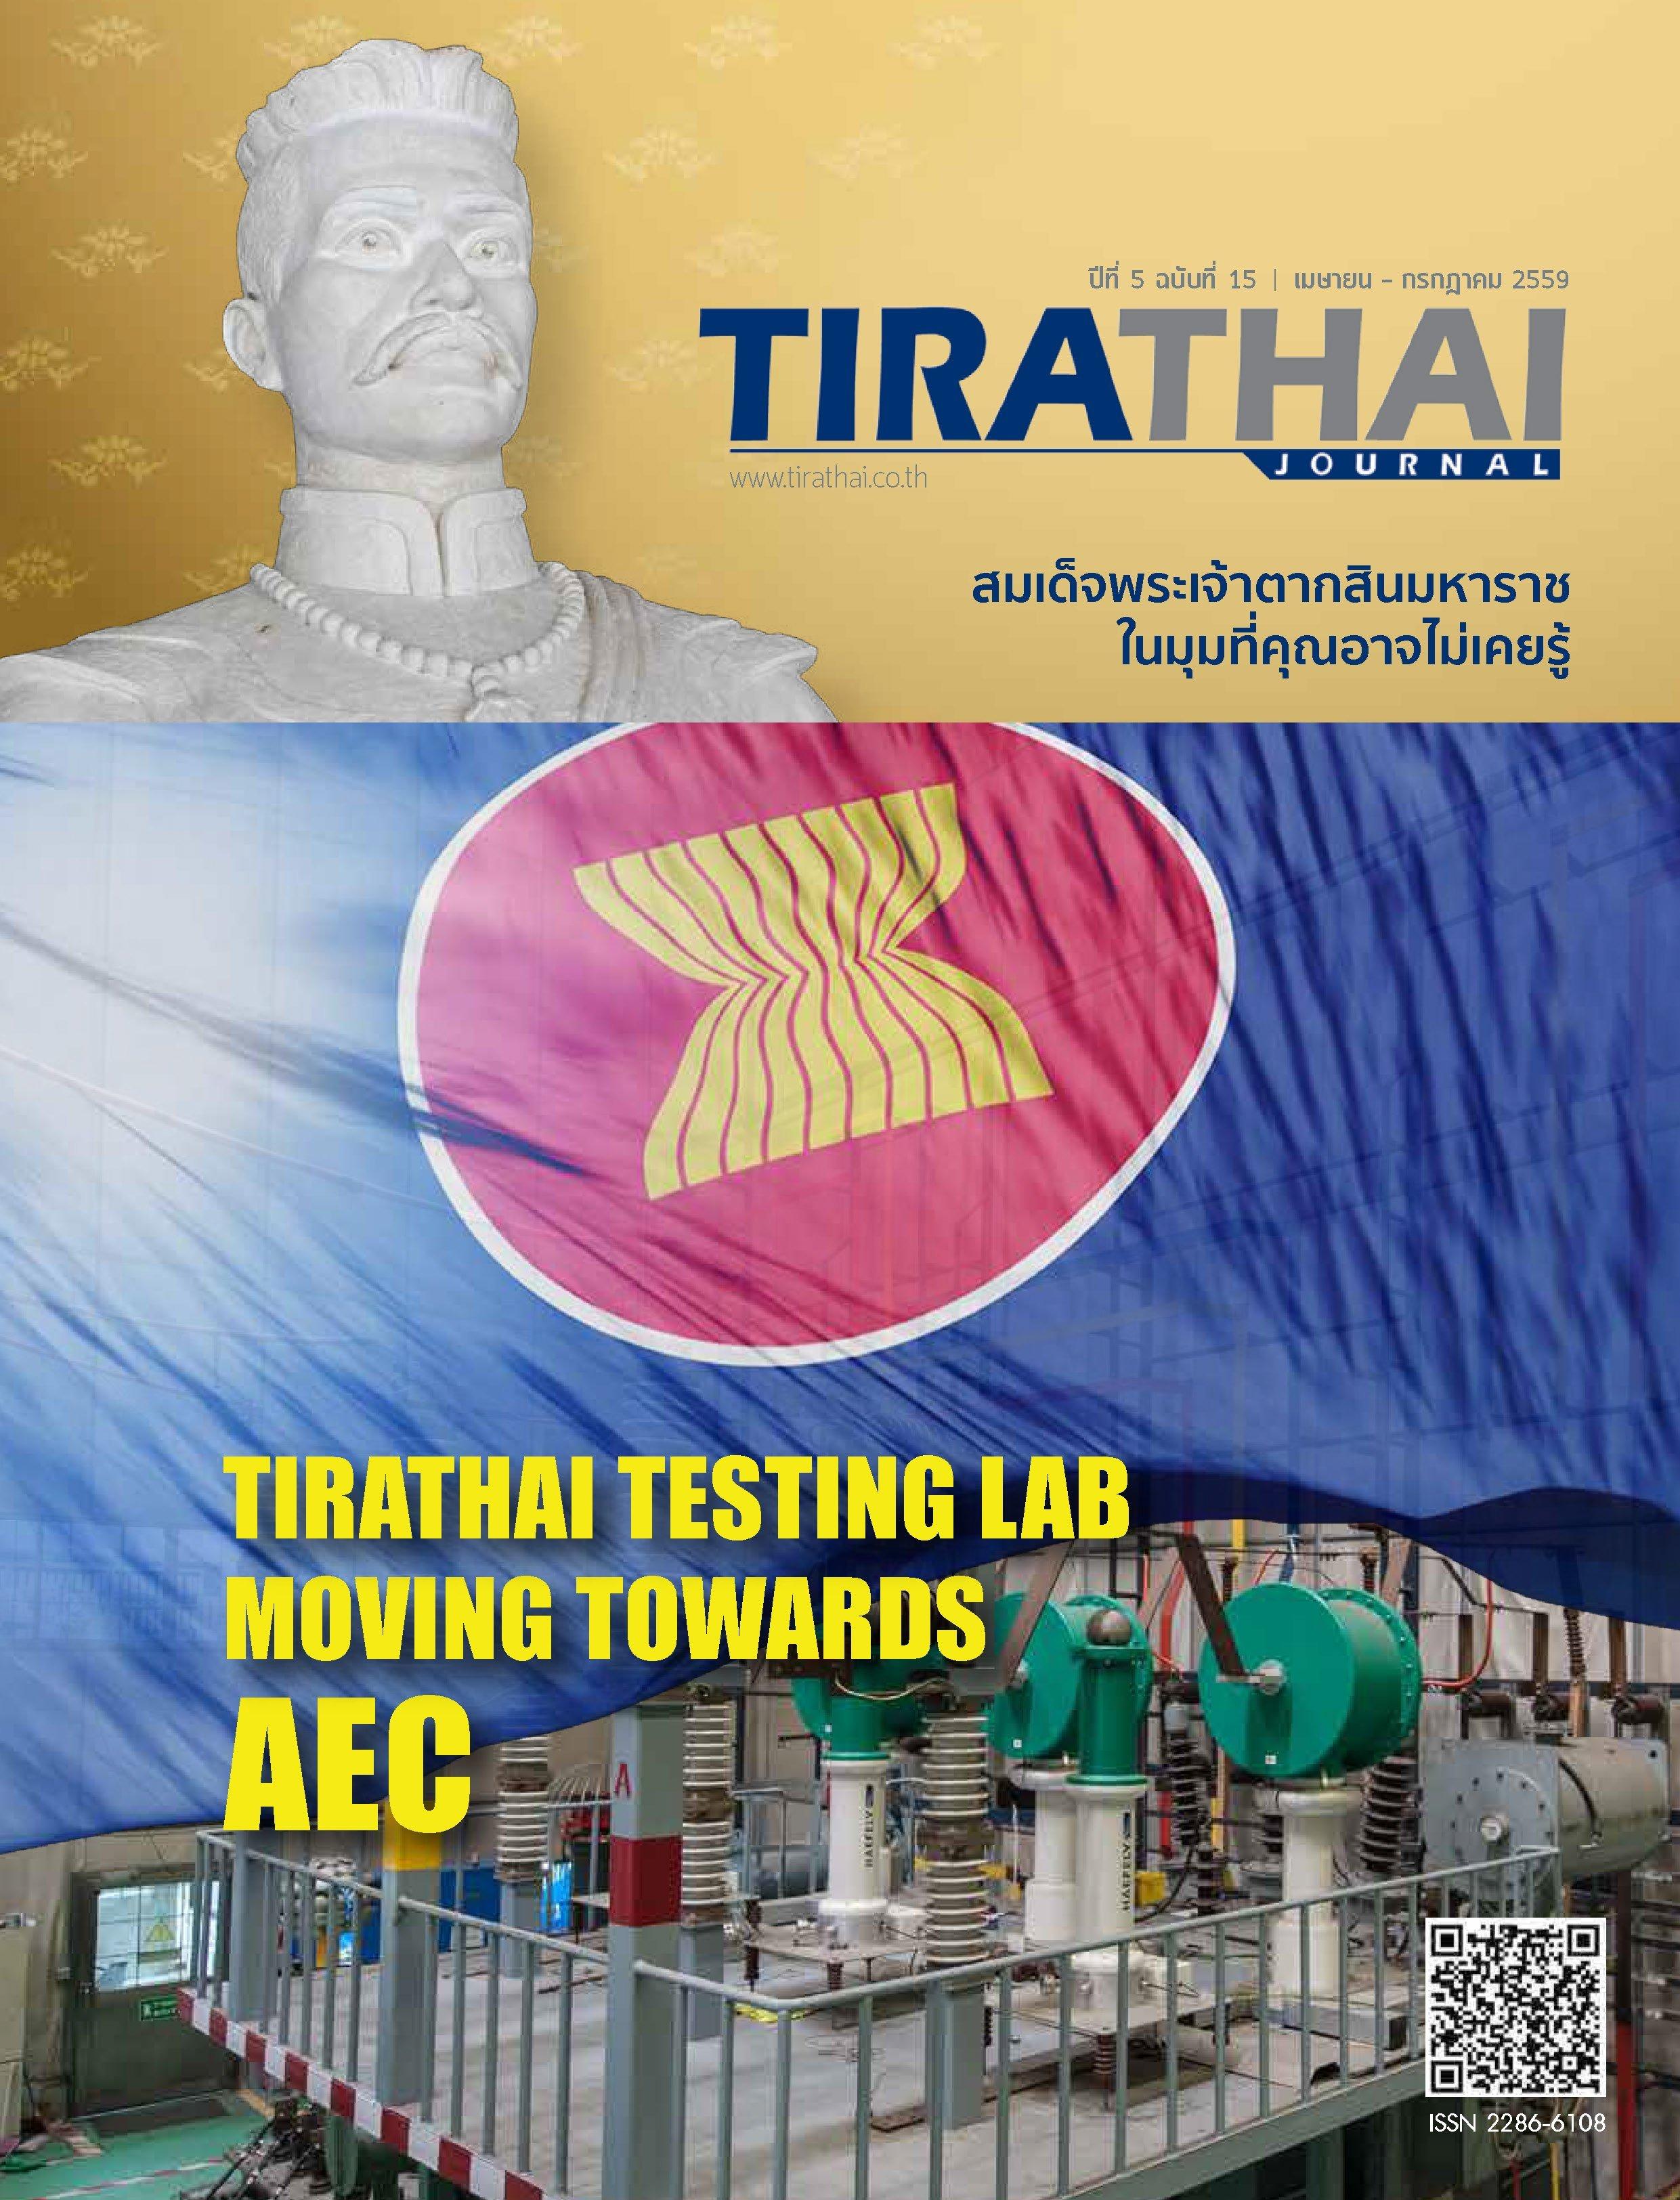 TIRATHAI TESTING LAB MOVING TOWARDS AEC